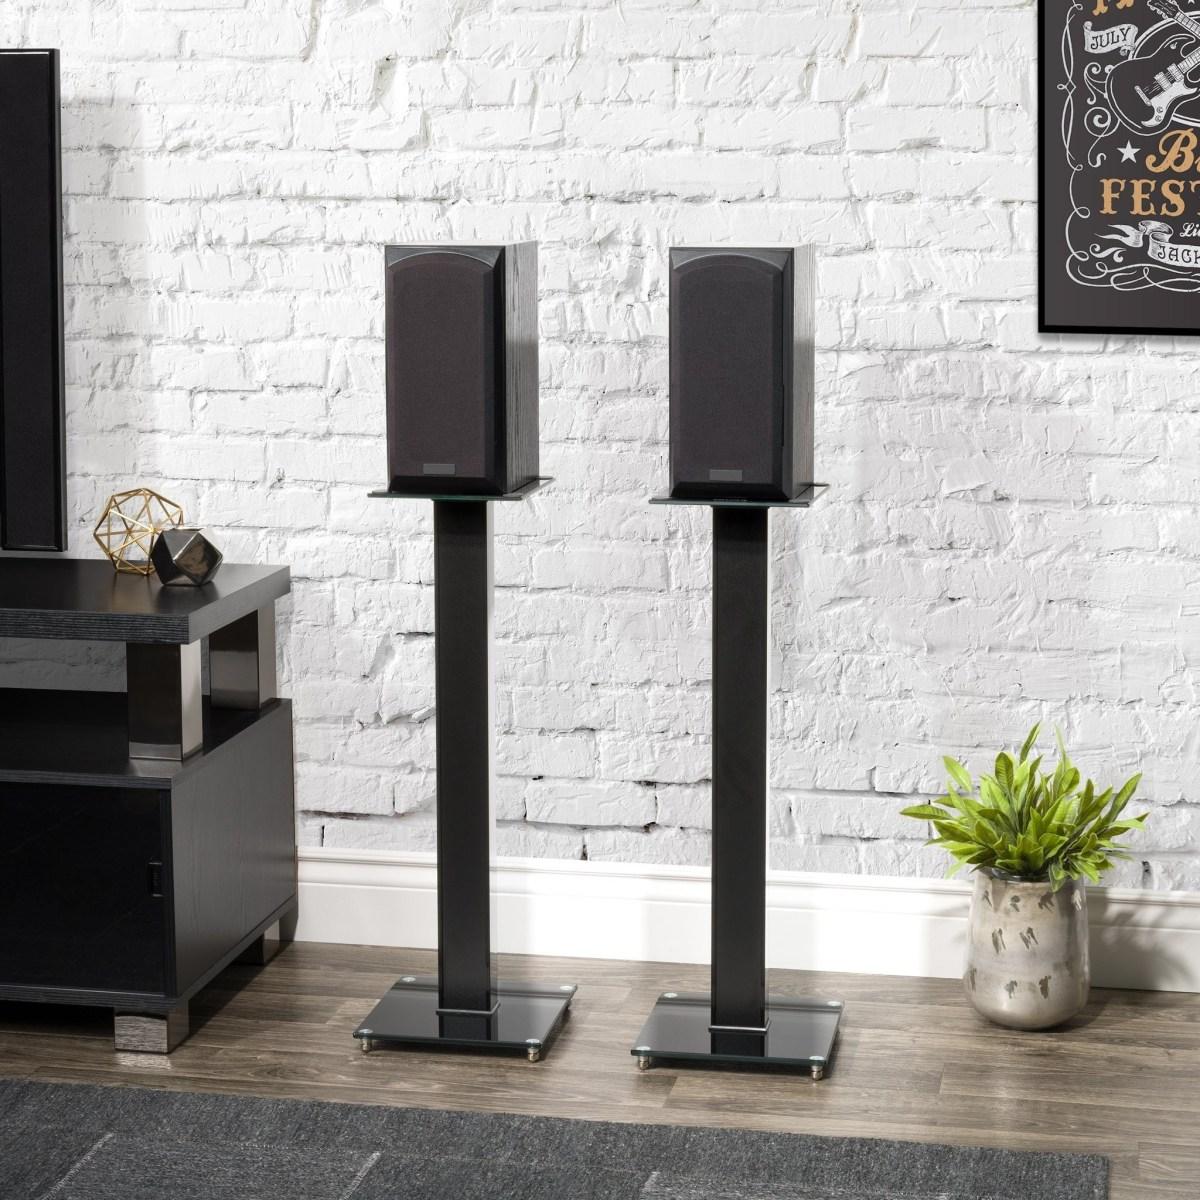 Engineered Wood Tempered Glass Steel Aluminium Fixed Height Speaker Stand